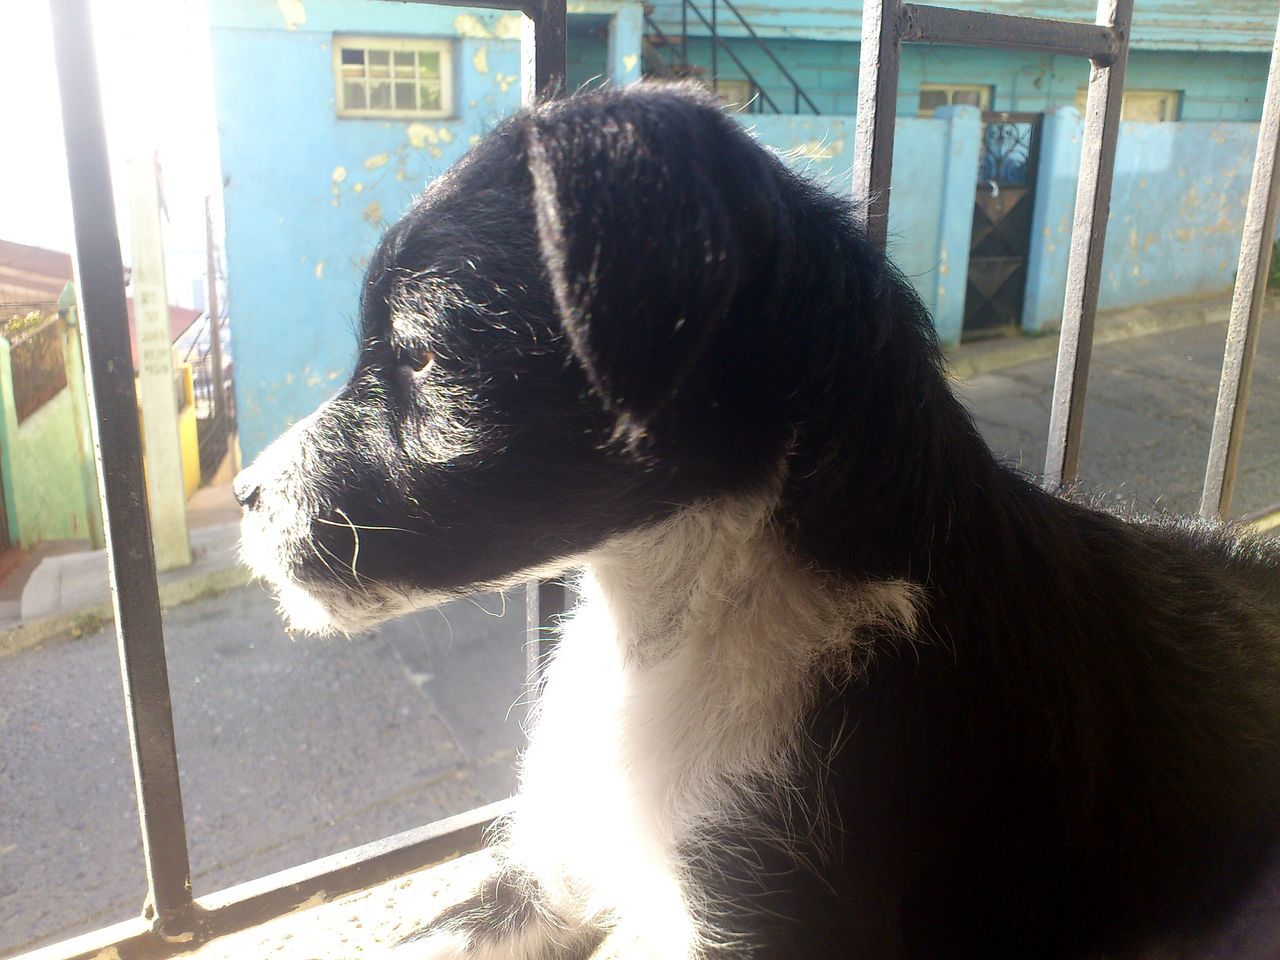 Dog Babydog Dog❤ Doglover Sun Sunlight Relax Valparaíso Chile Cerro Las Monjas Beatifull